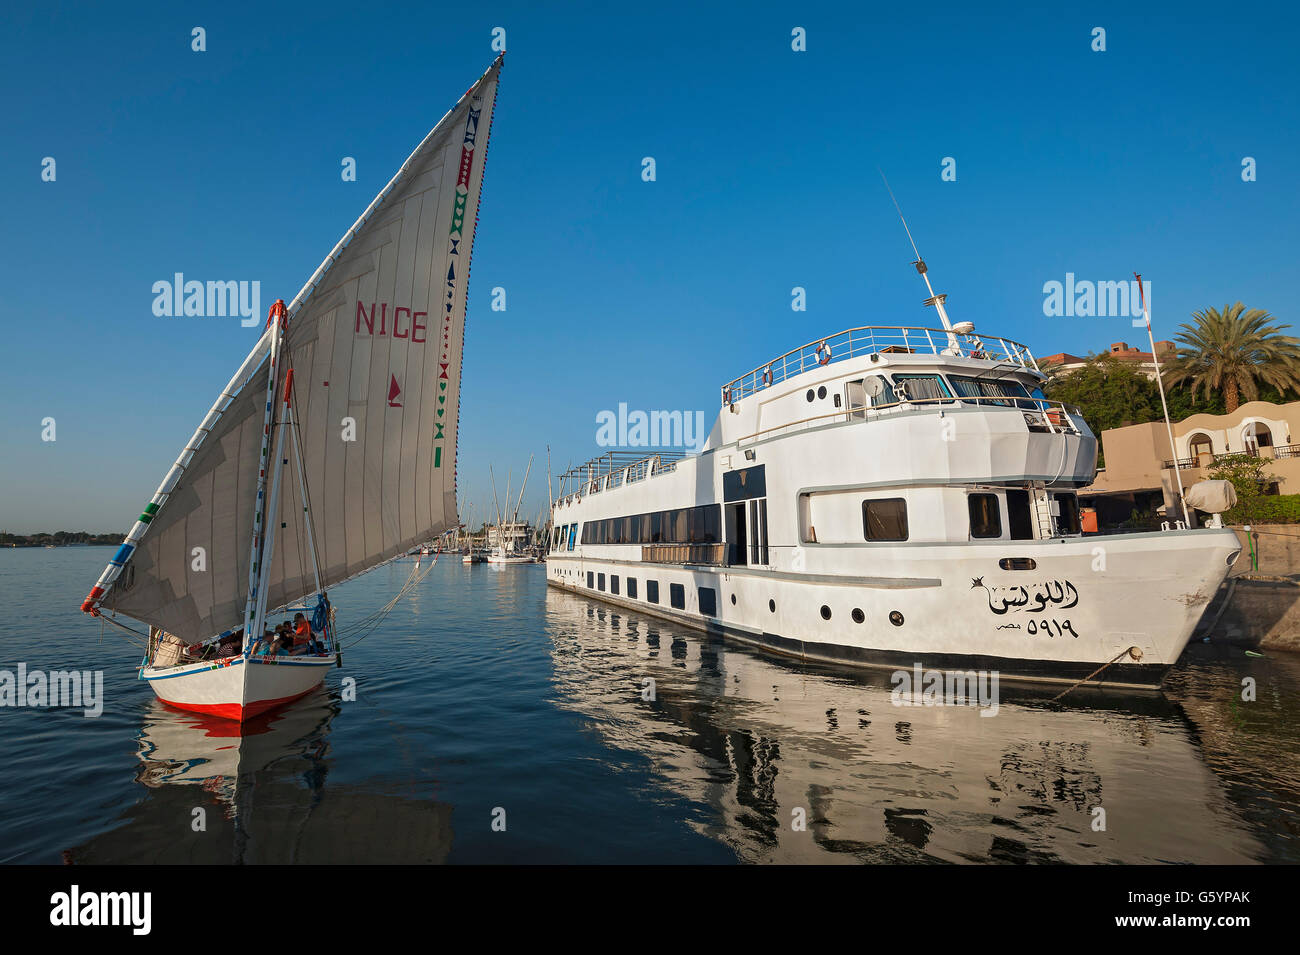 Single-masted sailing boat, dhow, passenger ship on the Nile, Luxor, Egypt Stock Photo